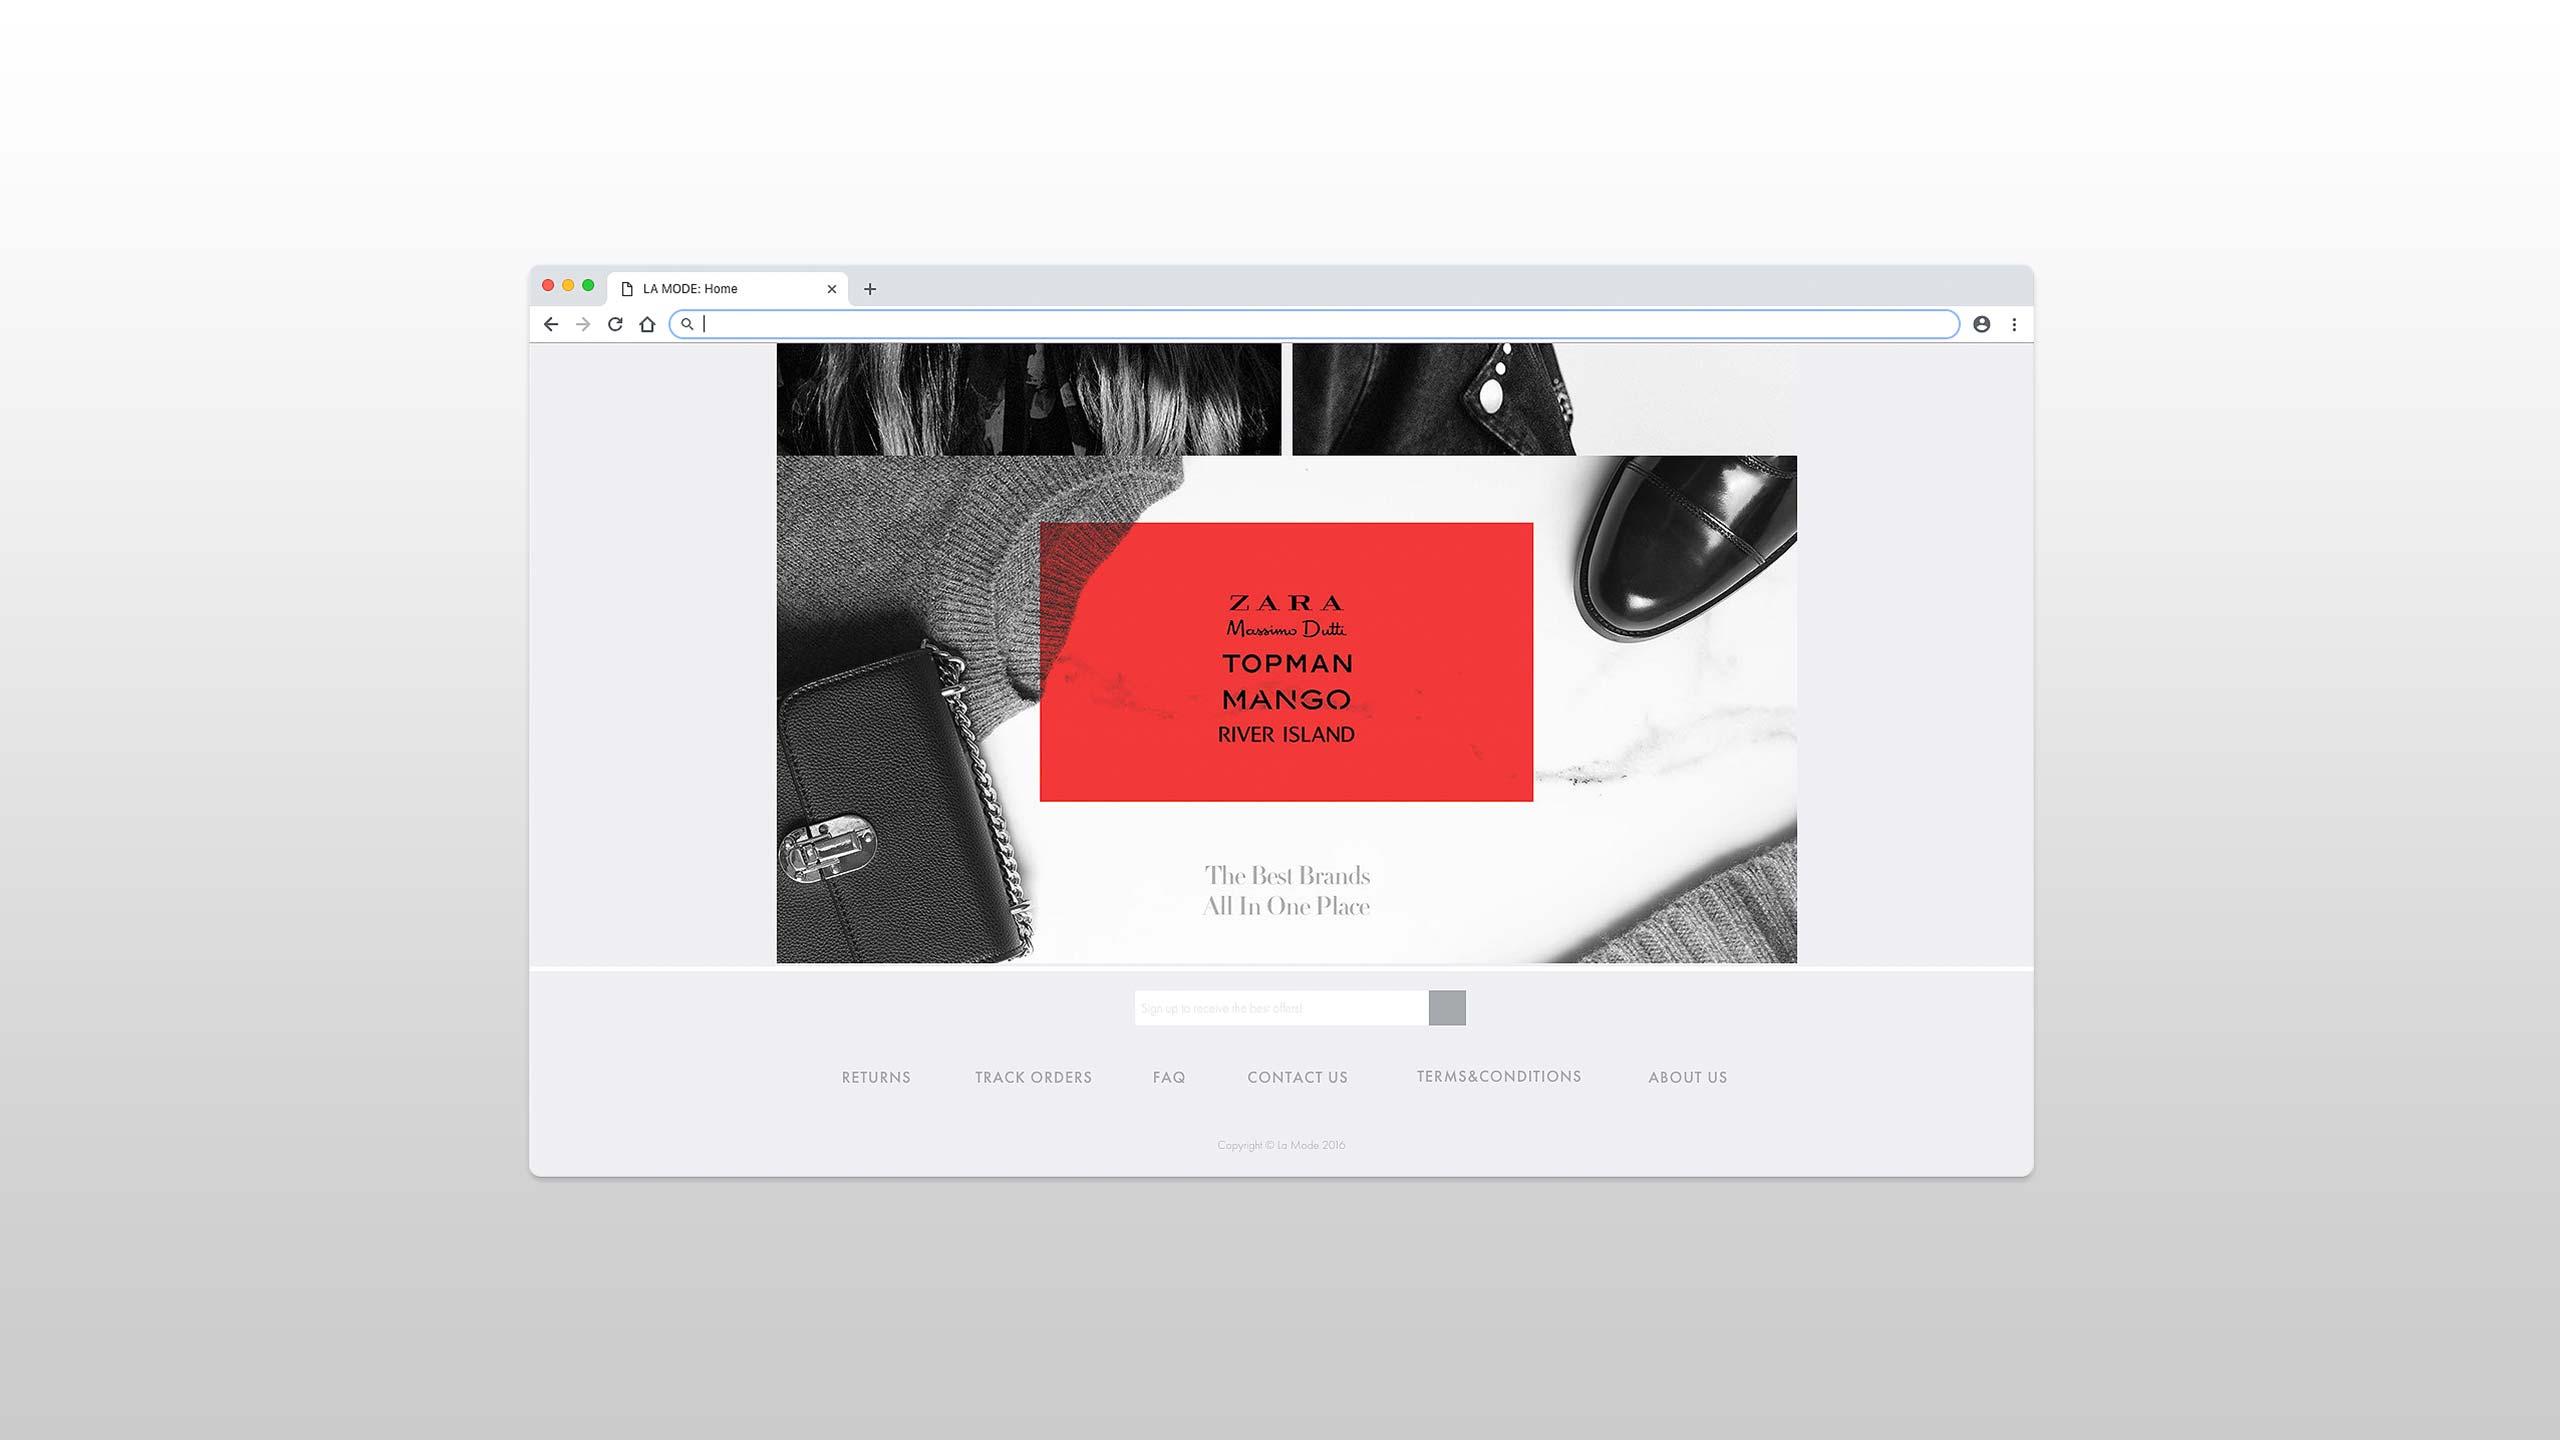 online shopping website footer